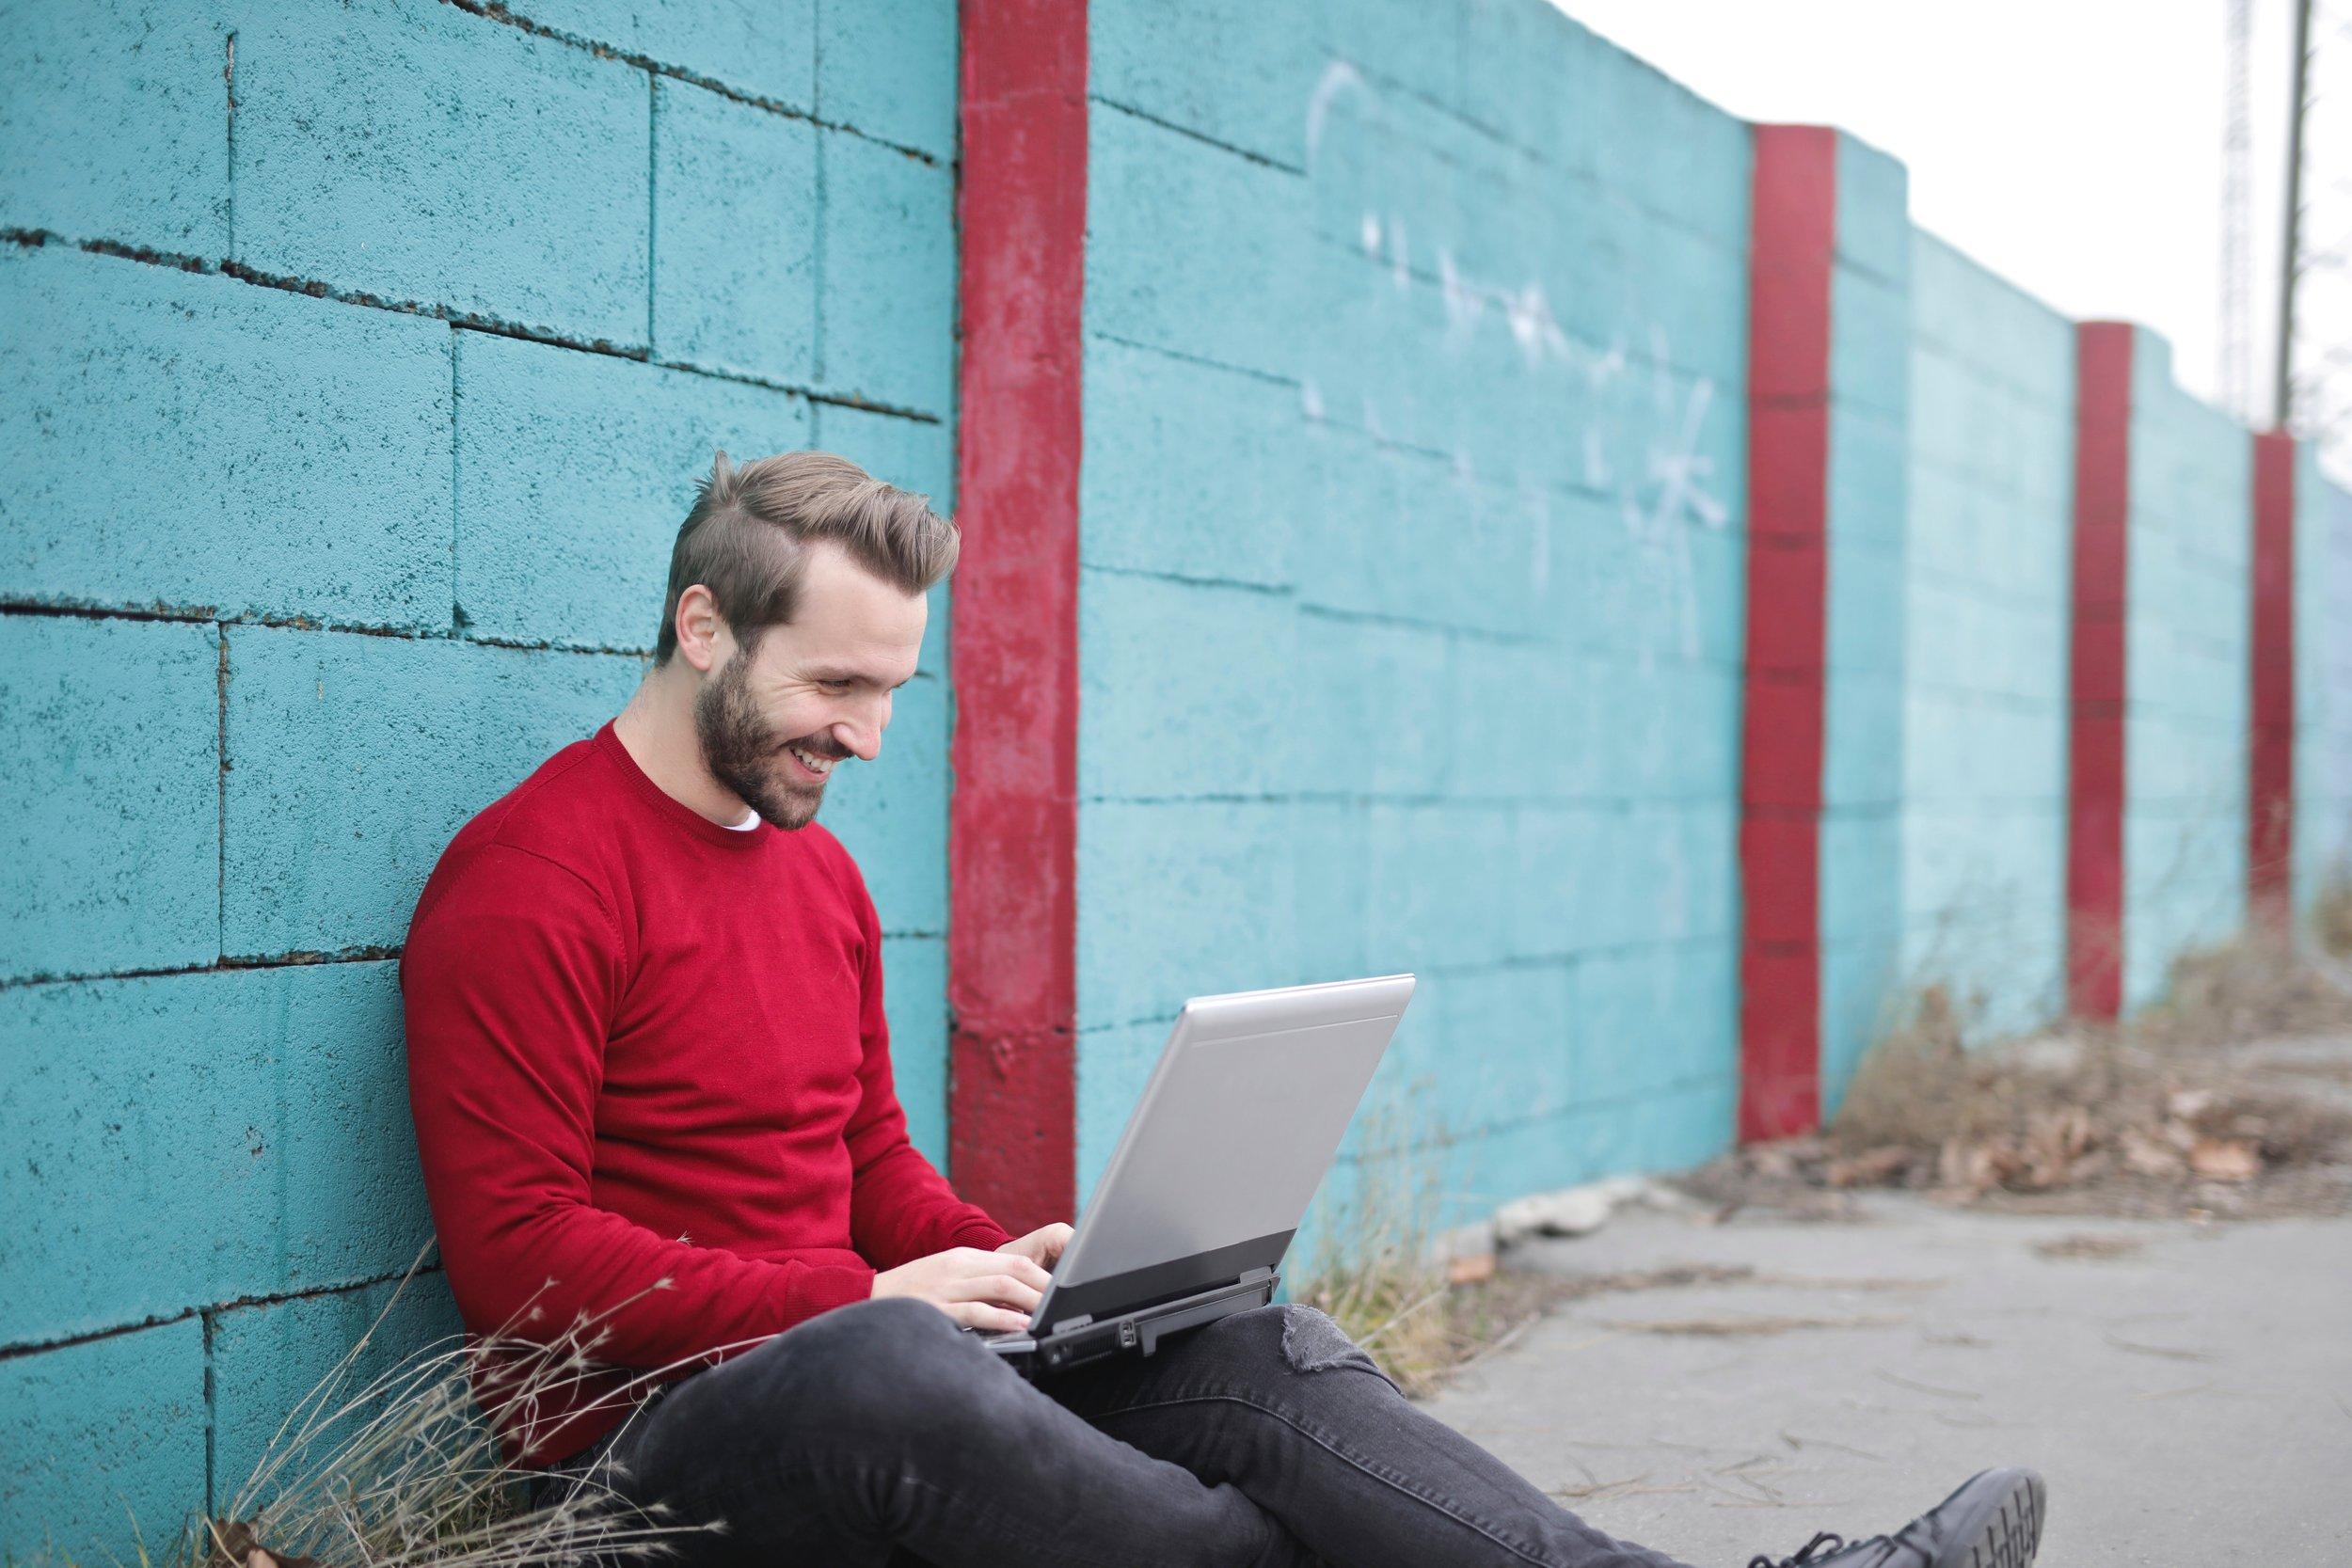 profiel online dating tips rolstoel Dating Club